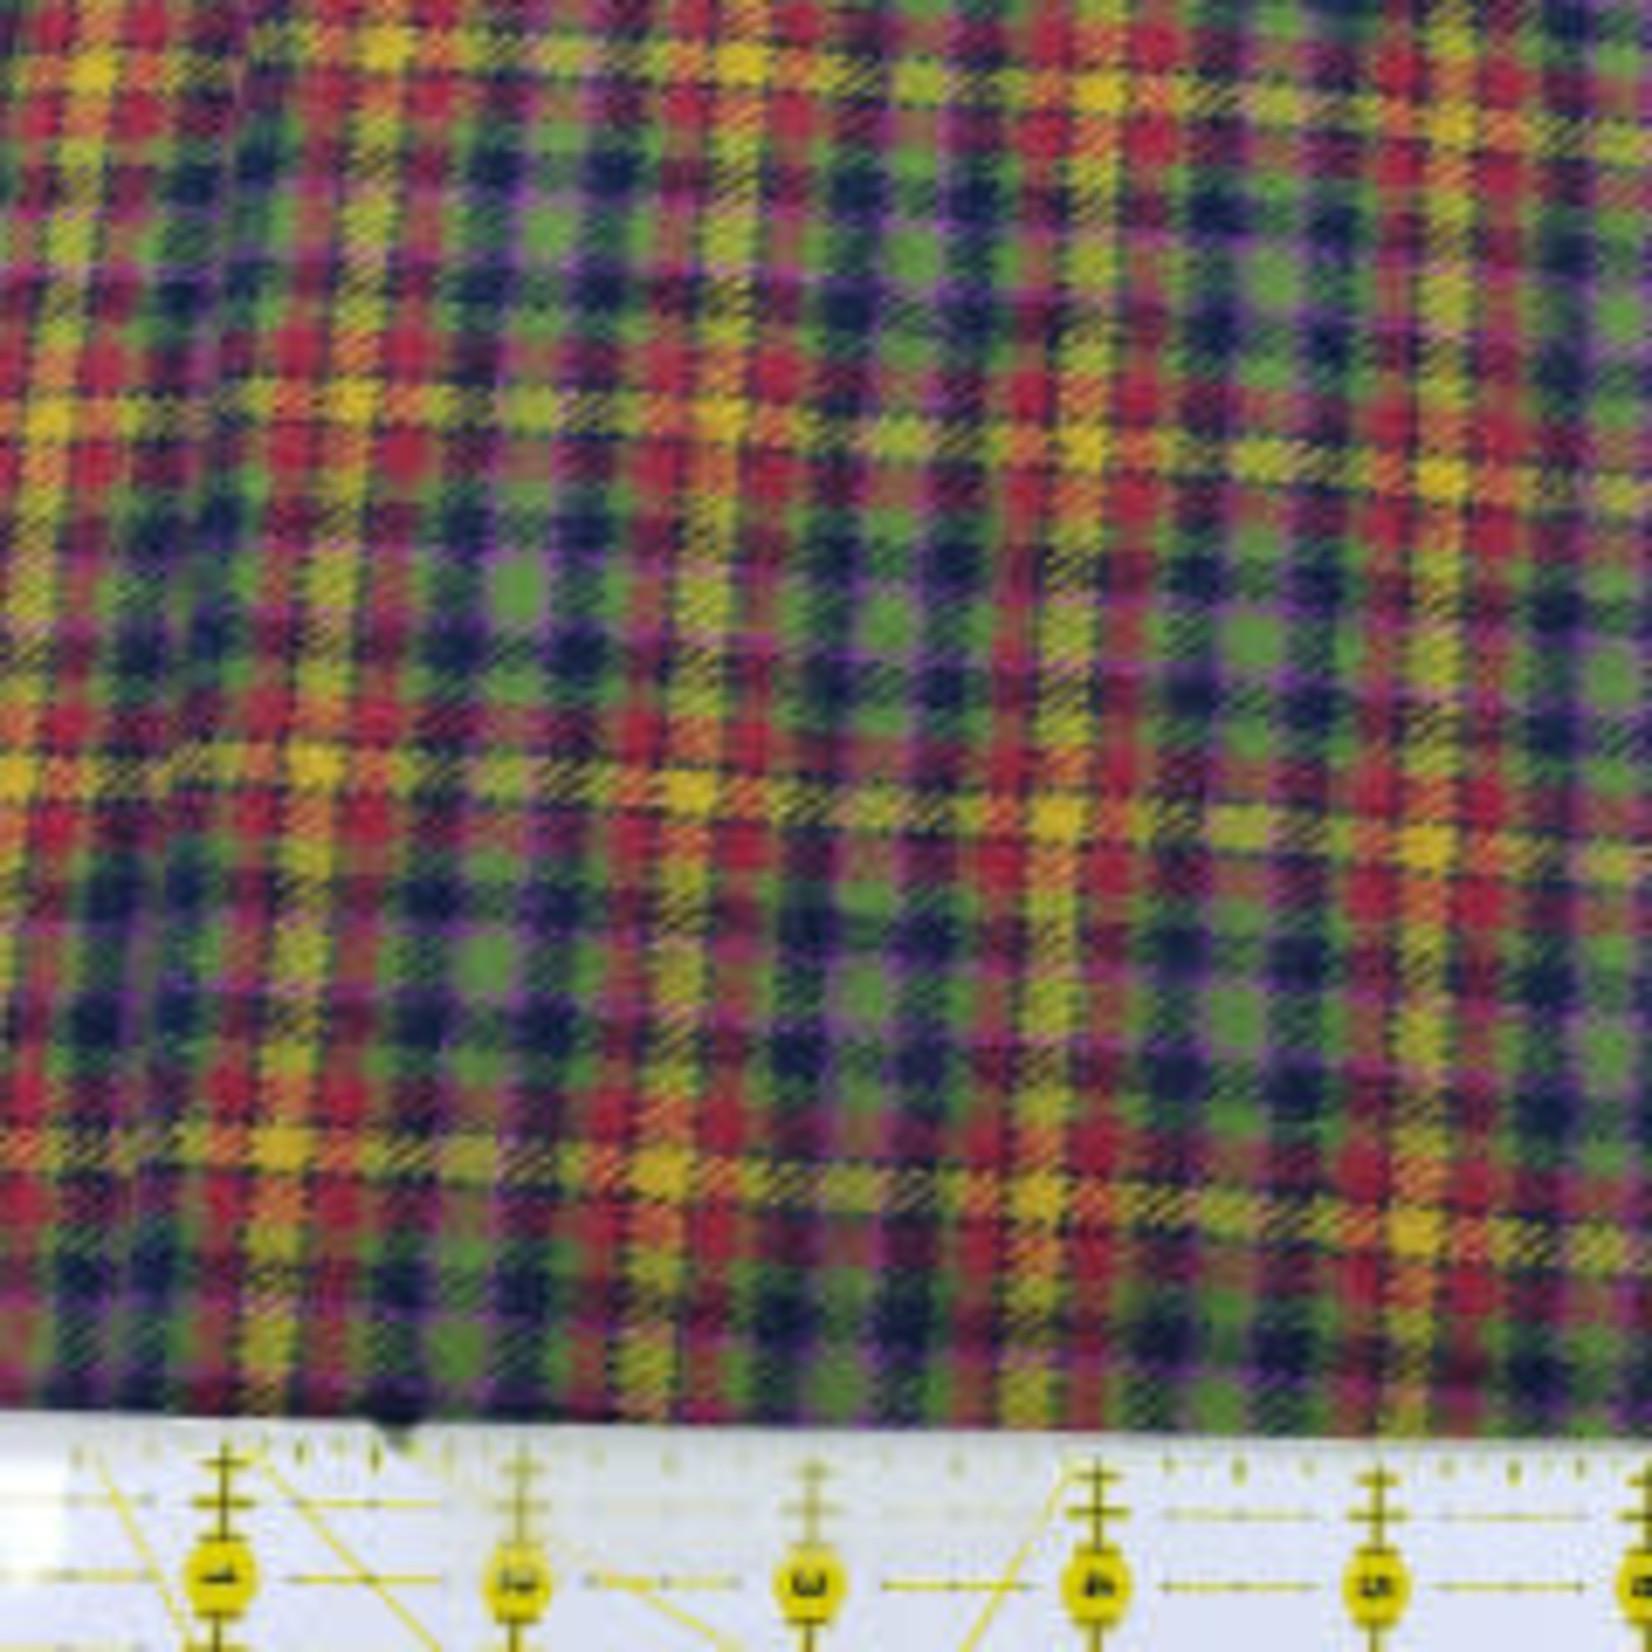 Marcus Fabrics 100cm Primo Flannel Plaids (Maple Lake), Red Green Yellow Black 111 - Per Cm or $16/m